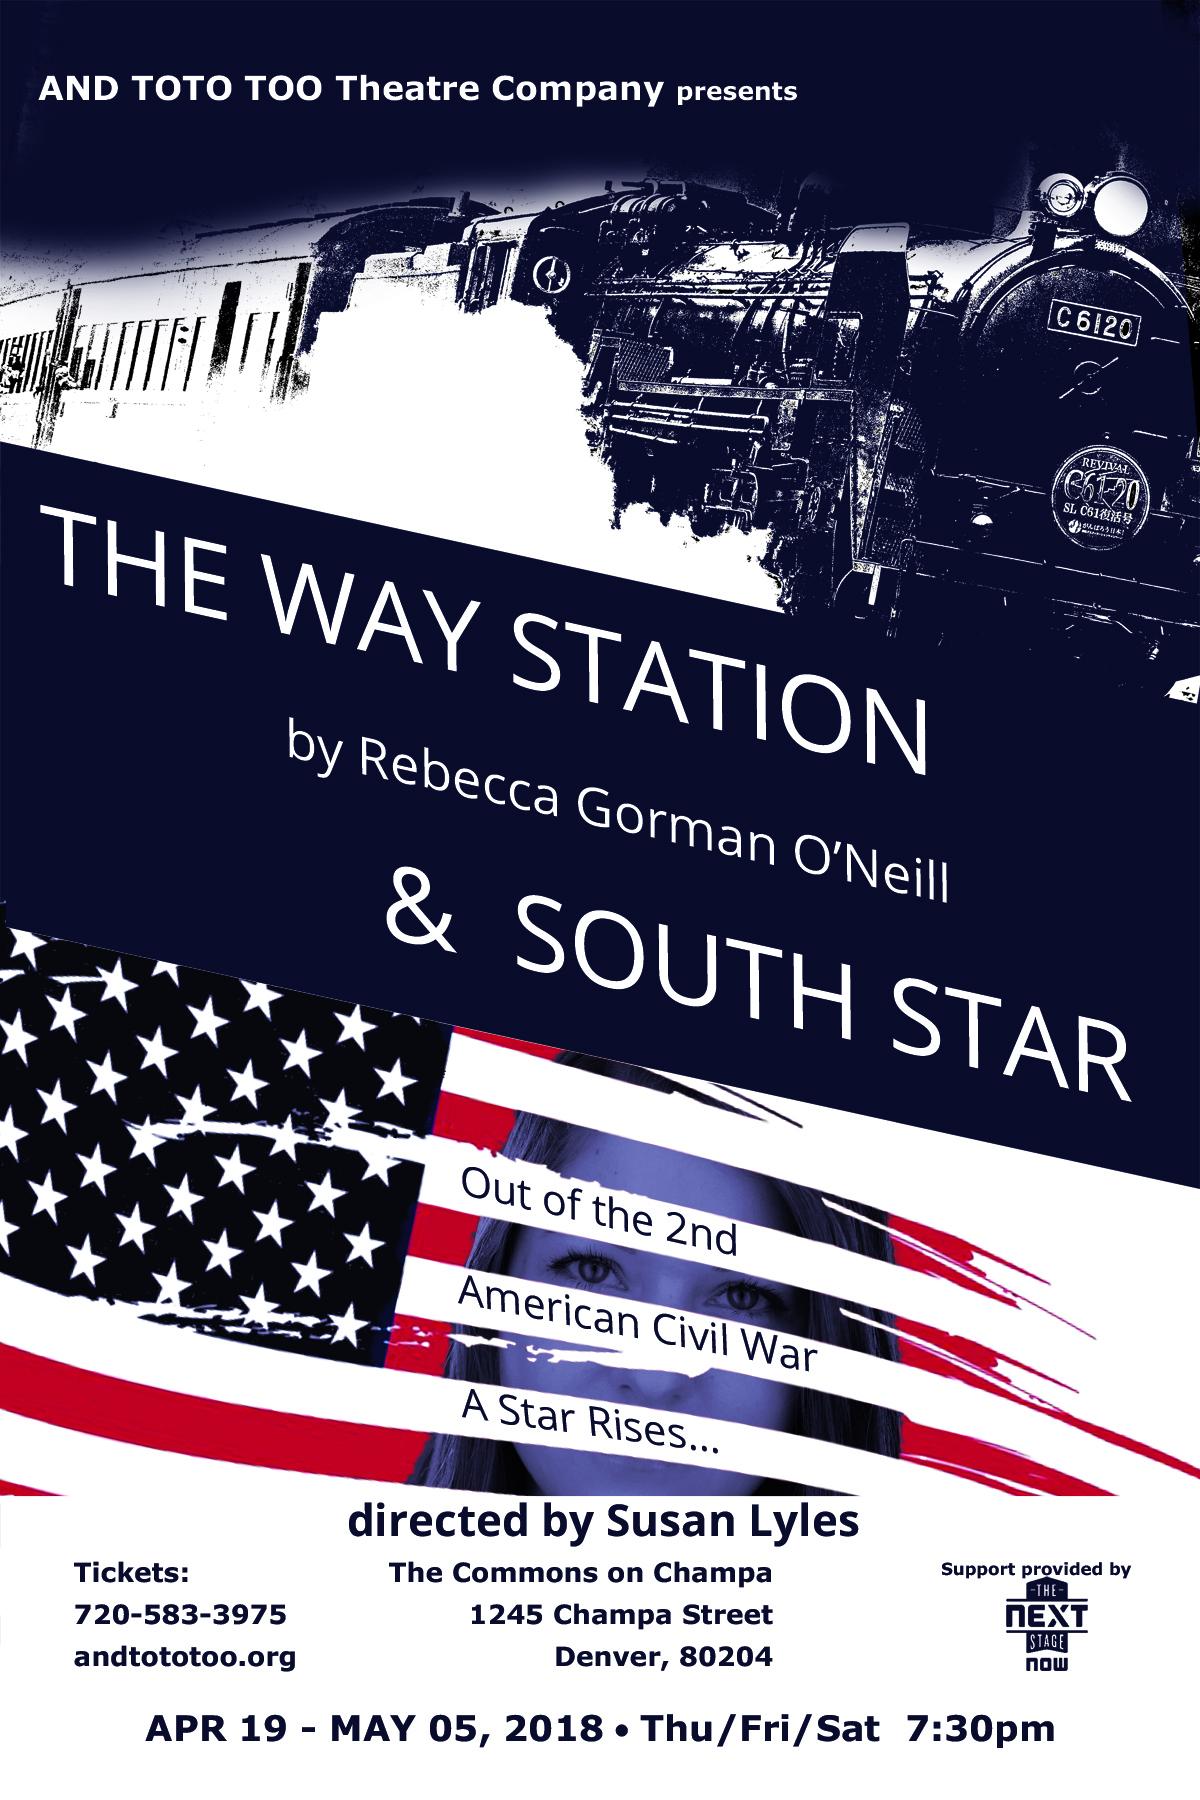 way_station_south_star4x6-2.jpg